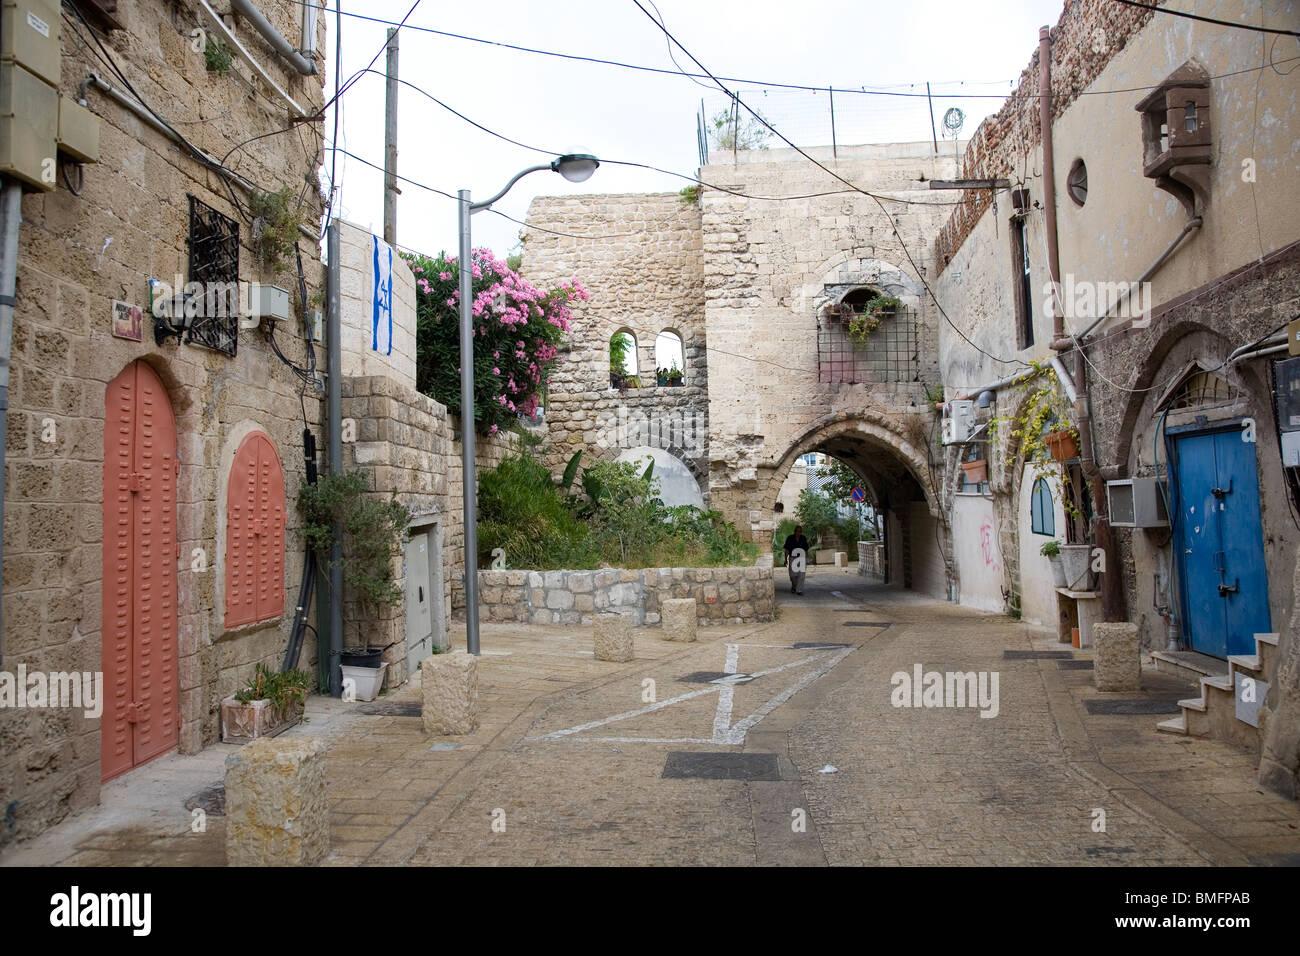 Street in Old Yafo - Stock Image